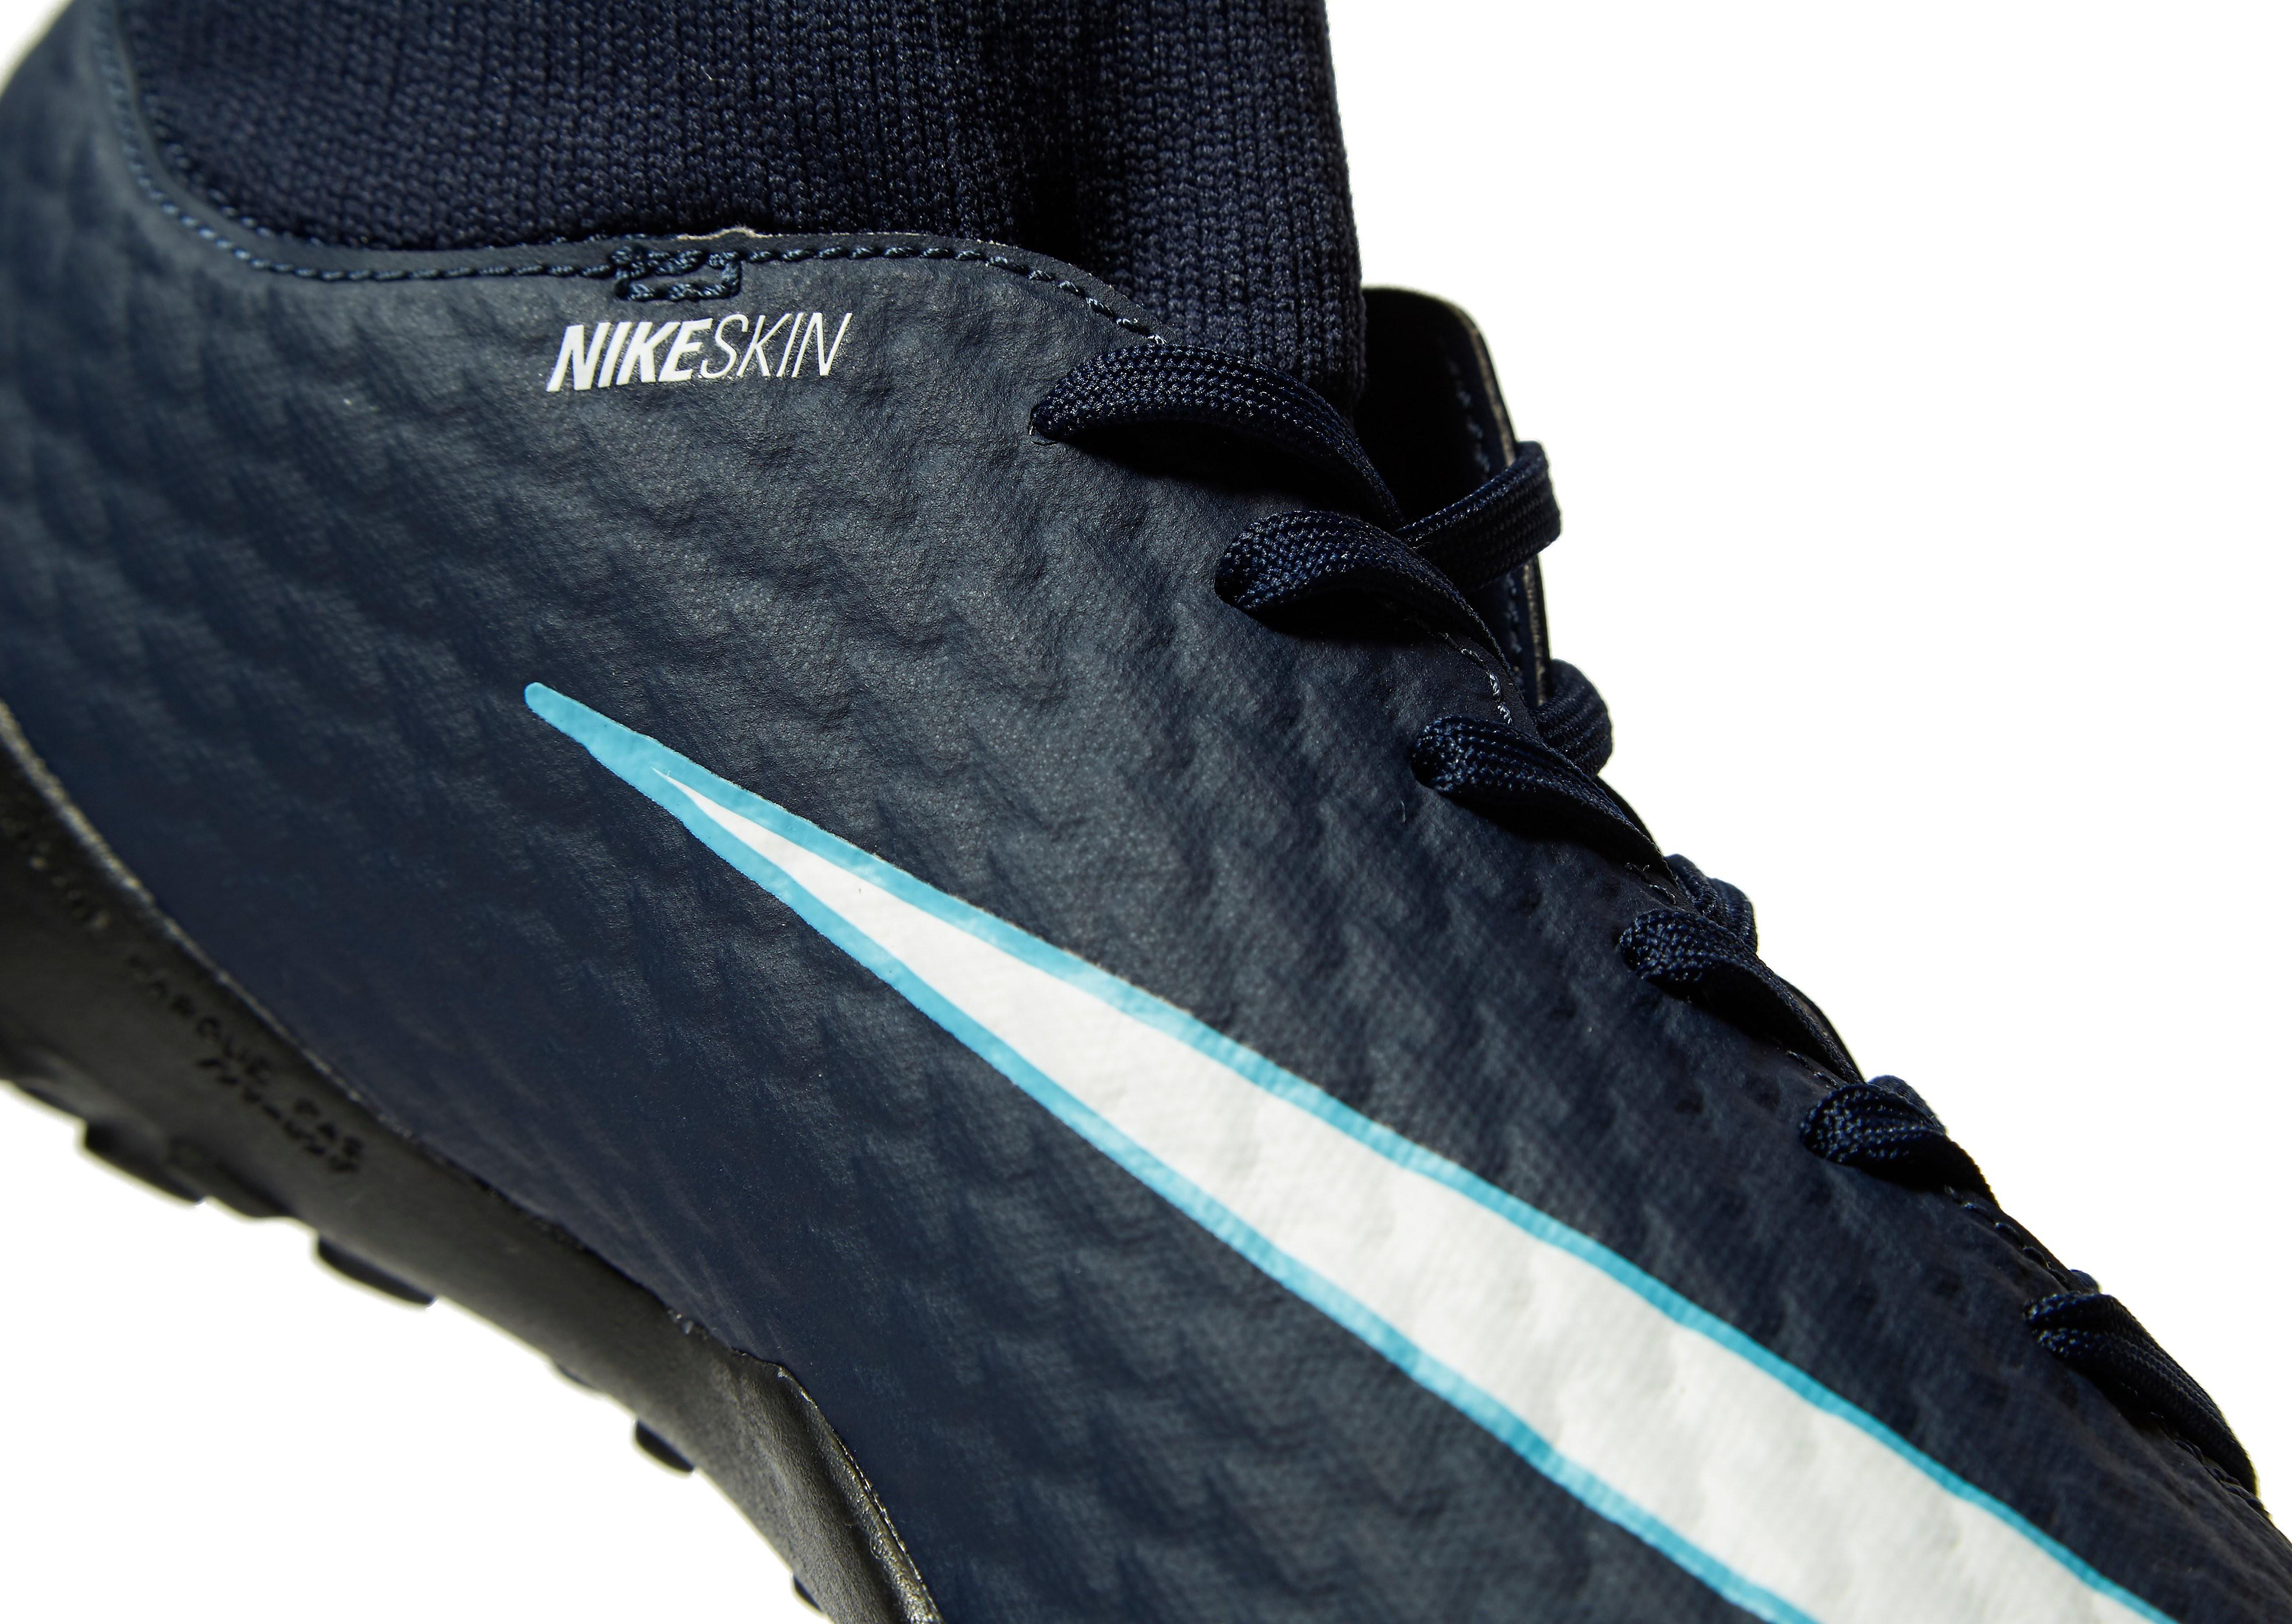 Nike Fire and Ice Hypervenom Phelon TF